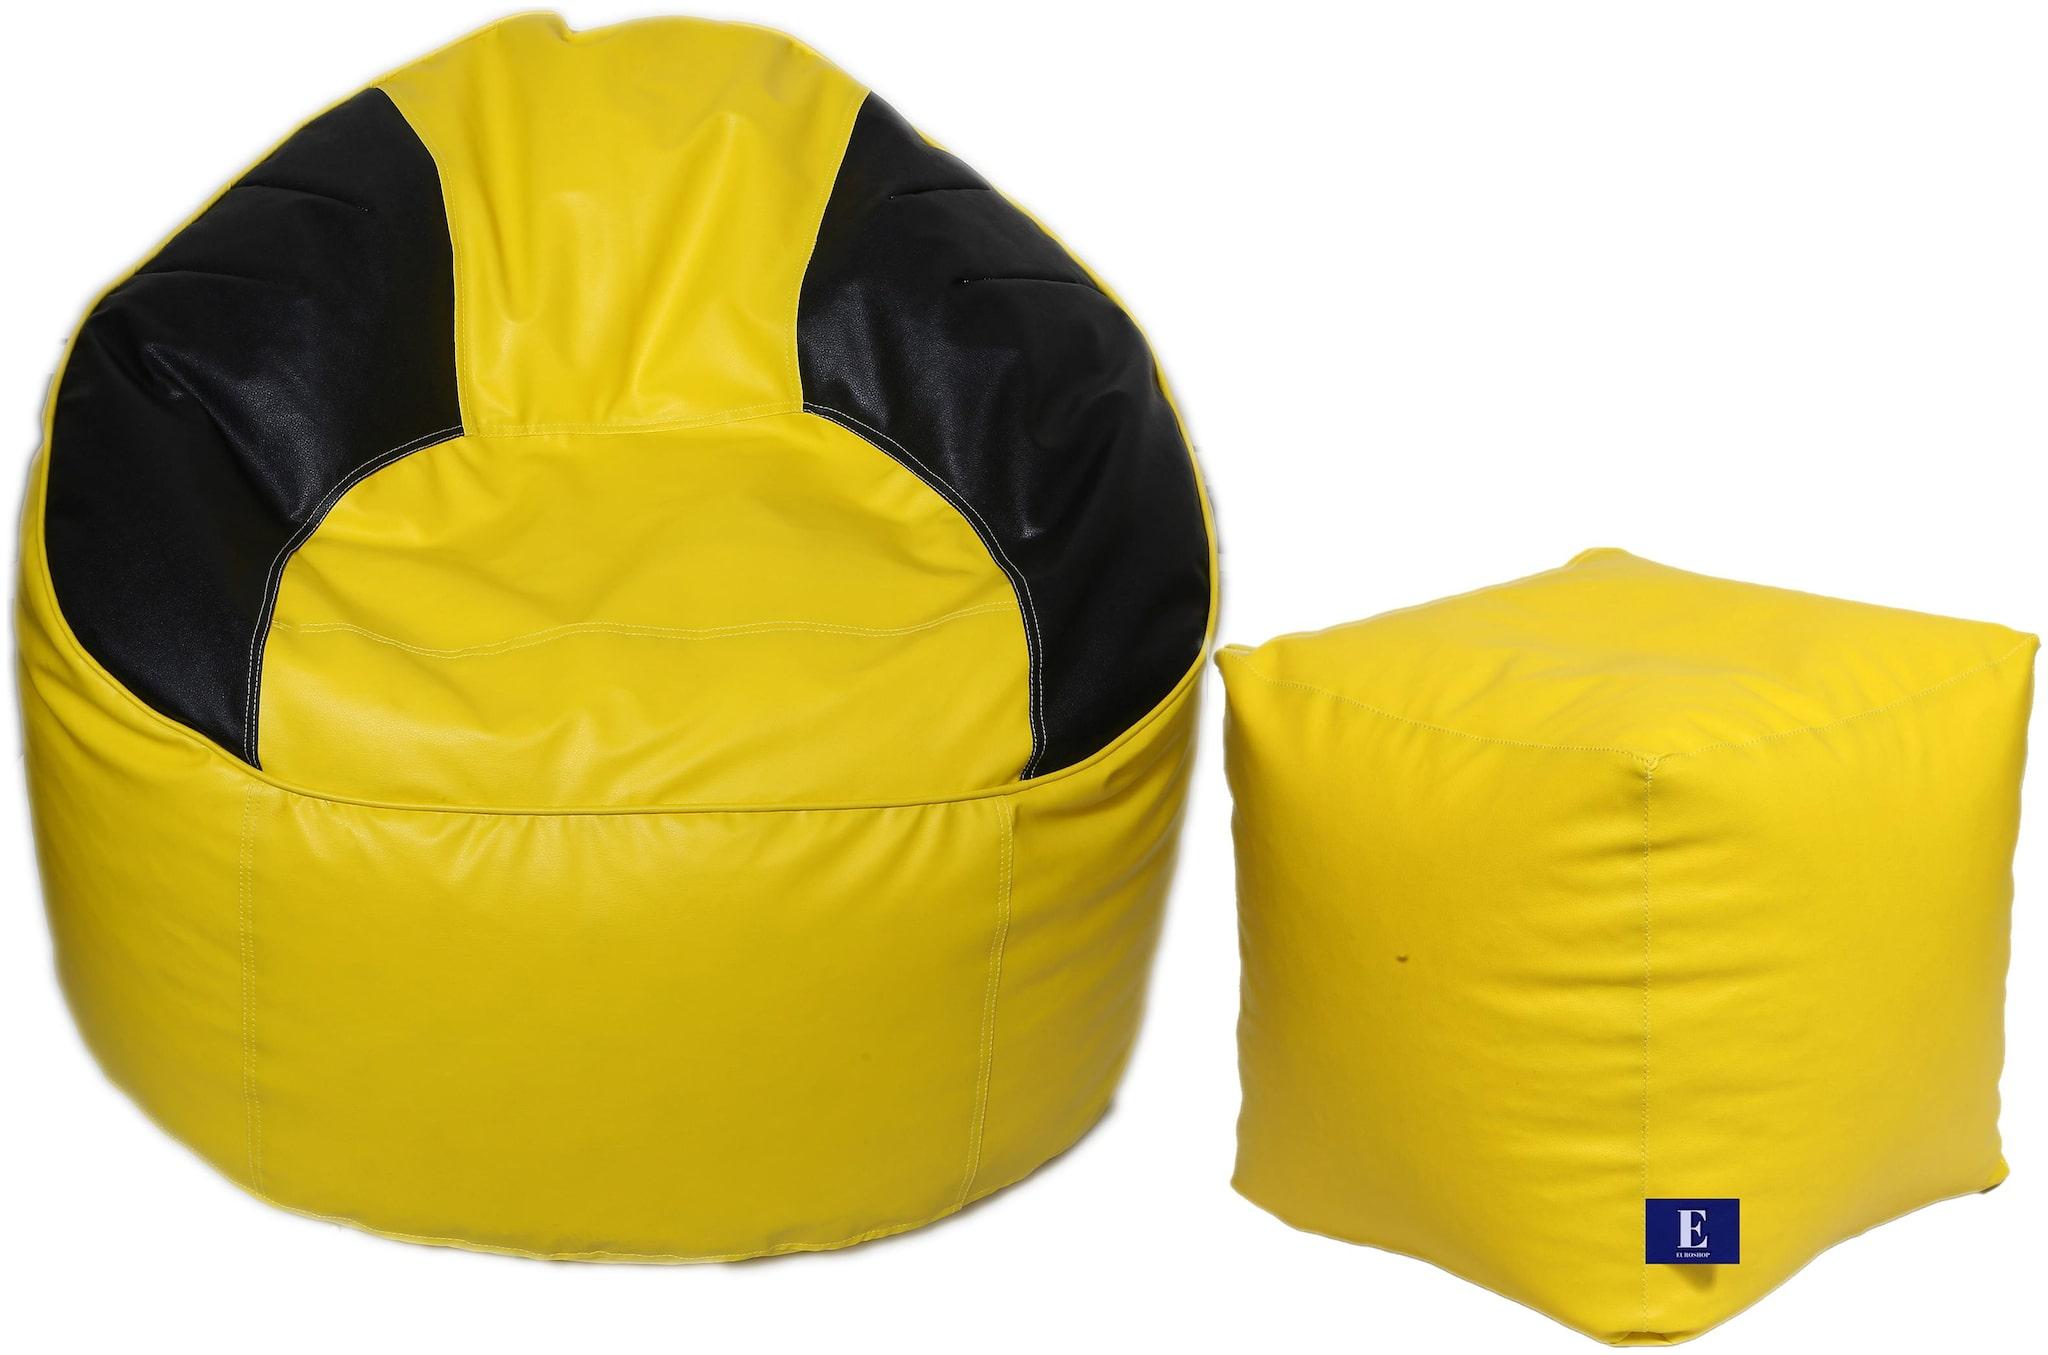 Euroshop Bean Bag Mudha With Puffy Cover Xxxl Without Beans by Maruti Fun Bags